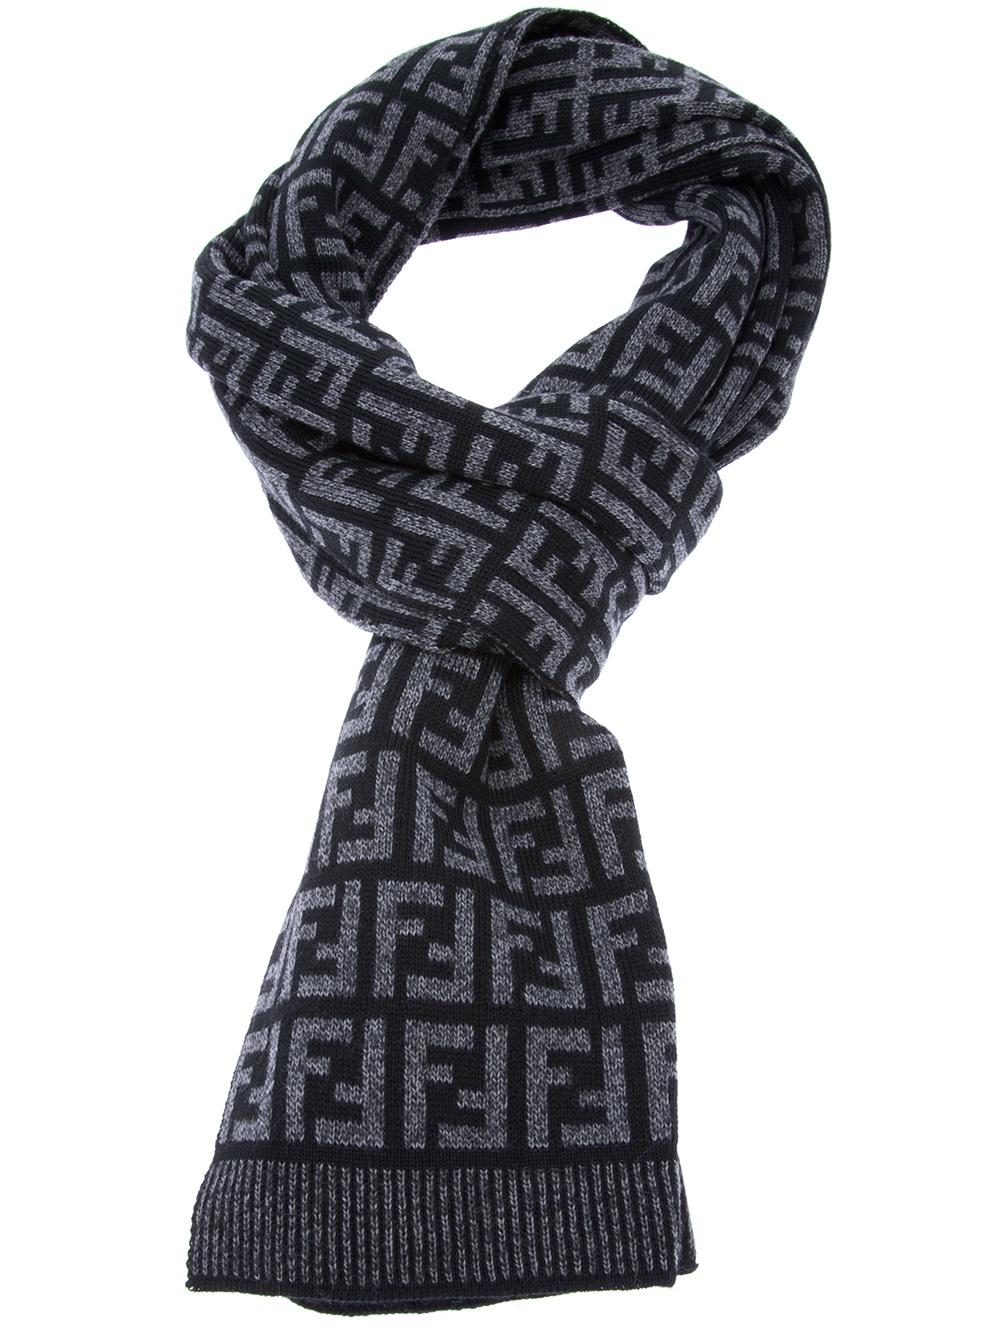 5800b359d67 ... australia lyst fendi logo print knit scarf in gray for men 12c7b 515e7